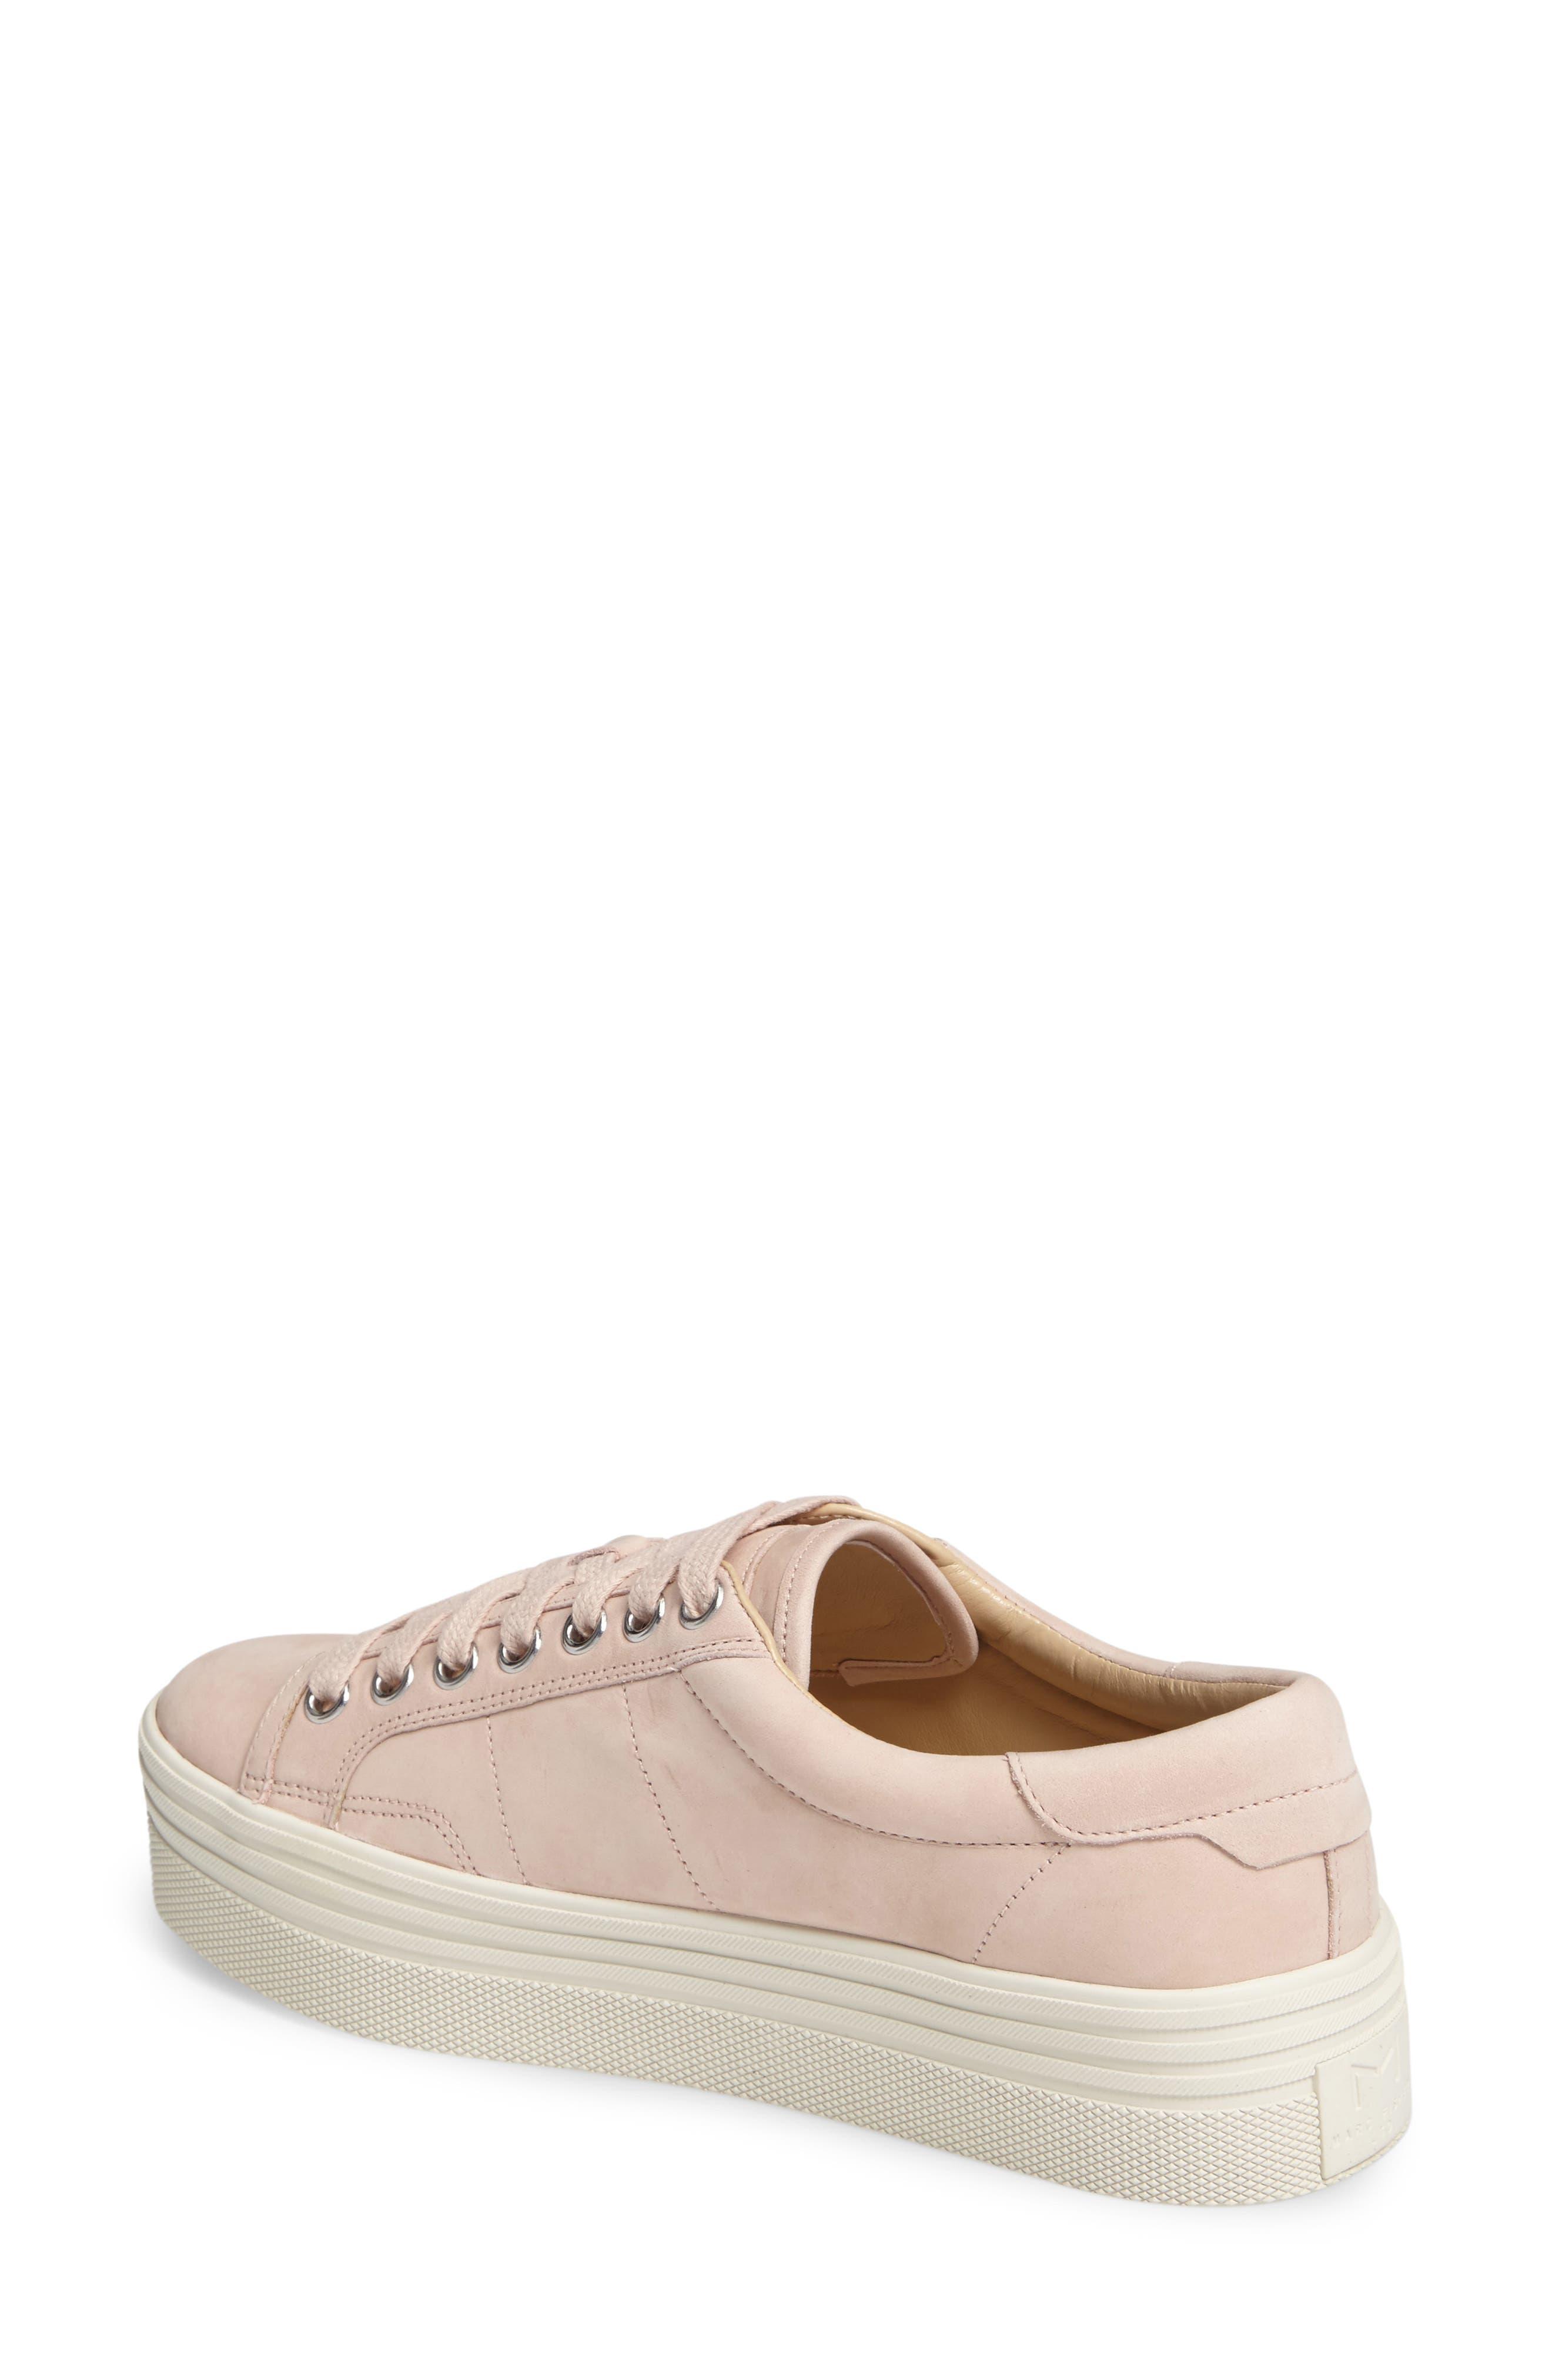 Emmy Platform Sneaker,                             Alternate thumbnail 2, color,                             Pink Nubuck Leather